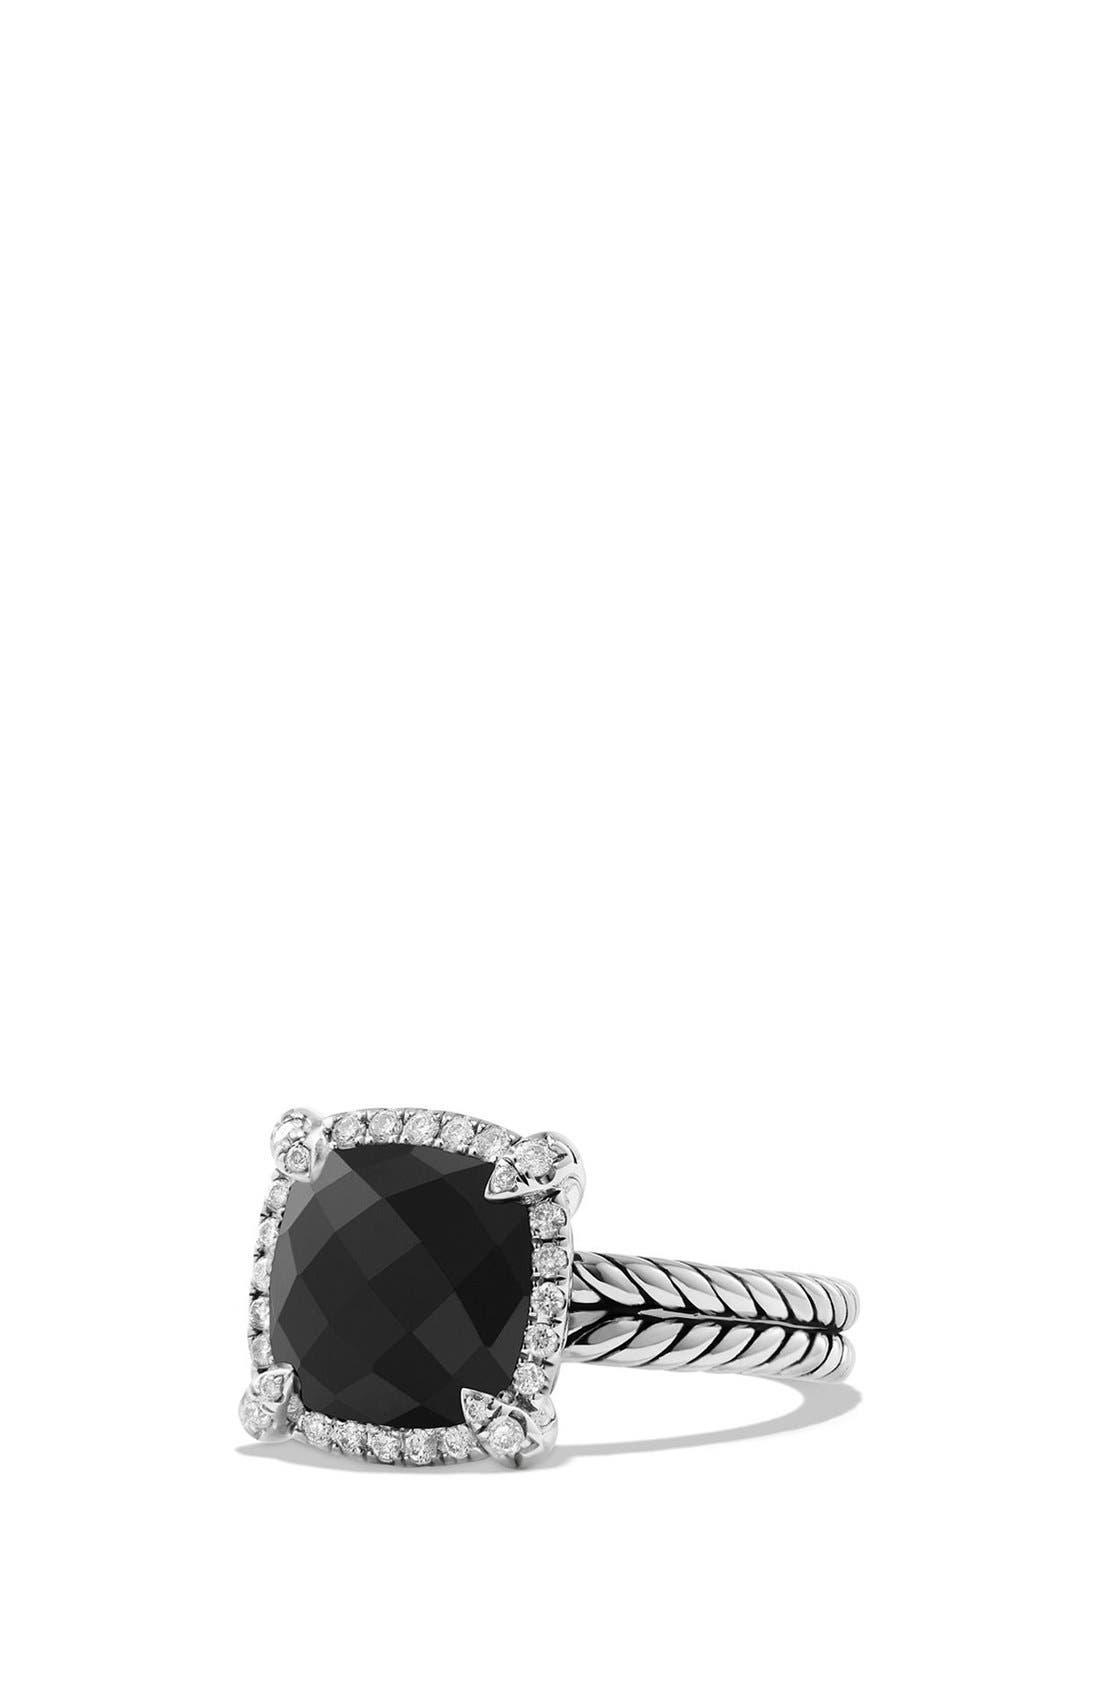 David Yurman 'Châtelaine' Small Pavé Bezel Ring with Diamonds